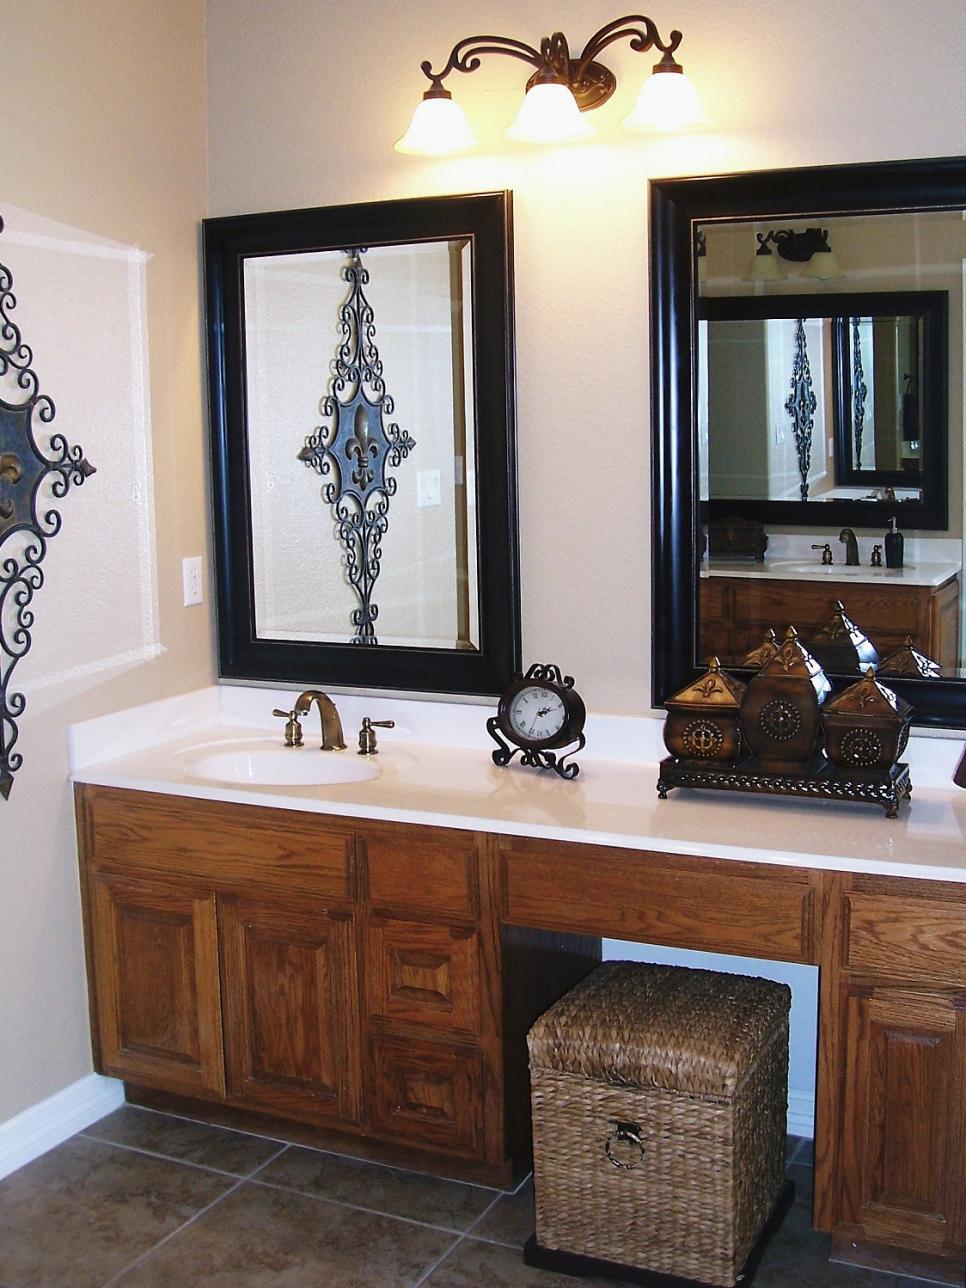 Compact 10 Beautiful Bathroom Mirrors | HGTV double vanity bathroom mirrors